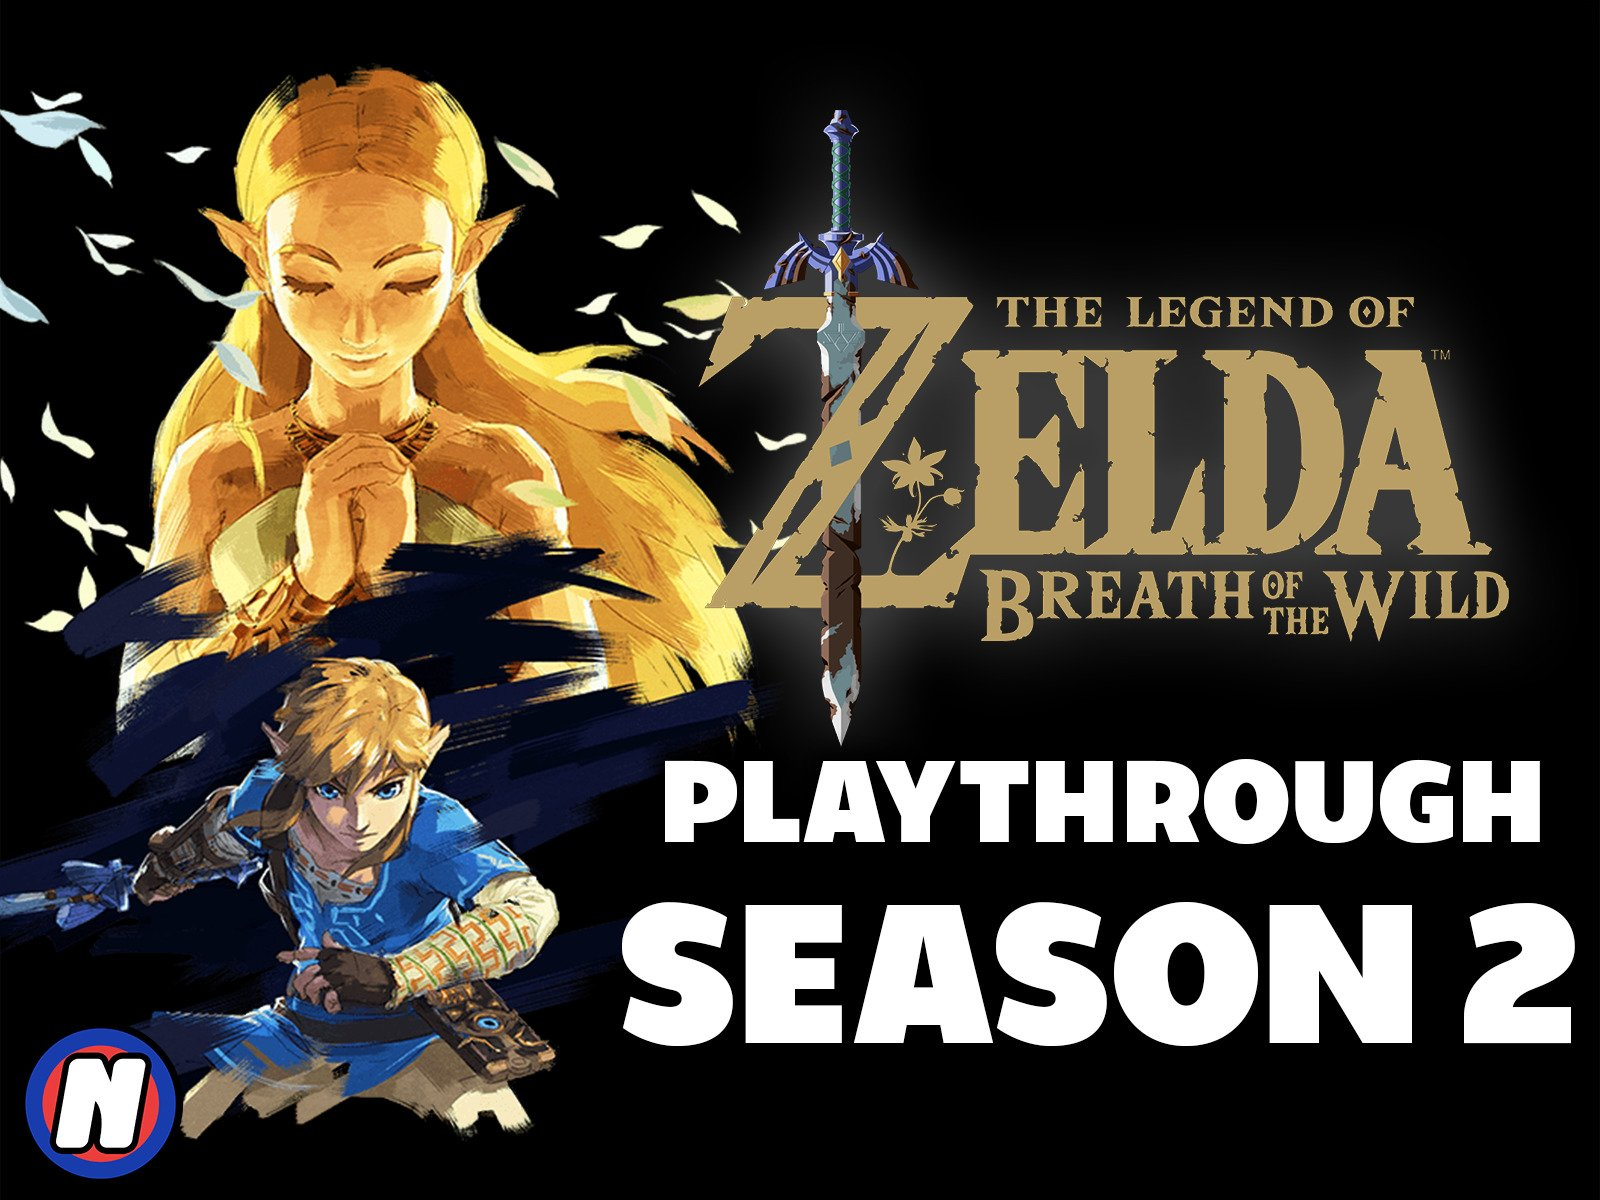 Clip: Legend of Zelda Breath of the Wild Playthrough - Season 2